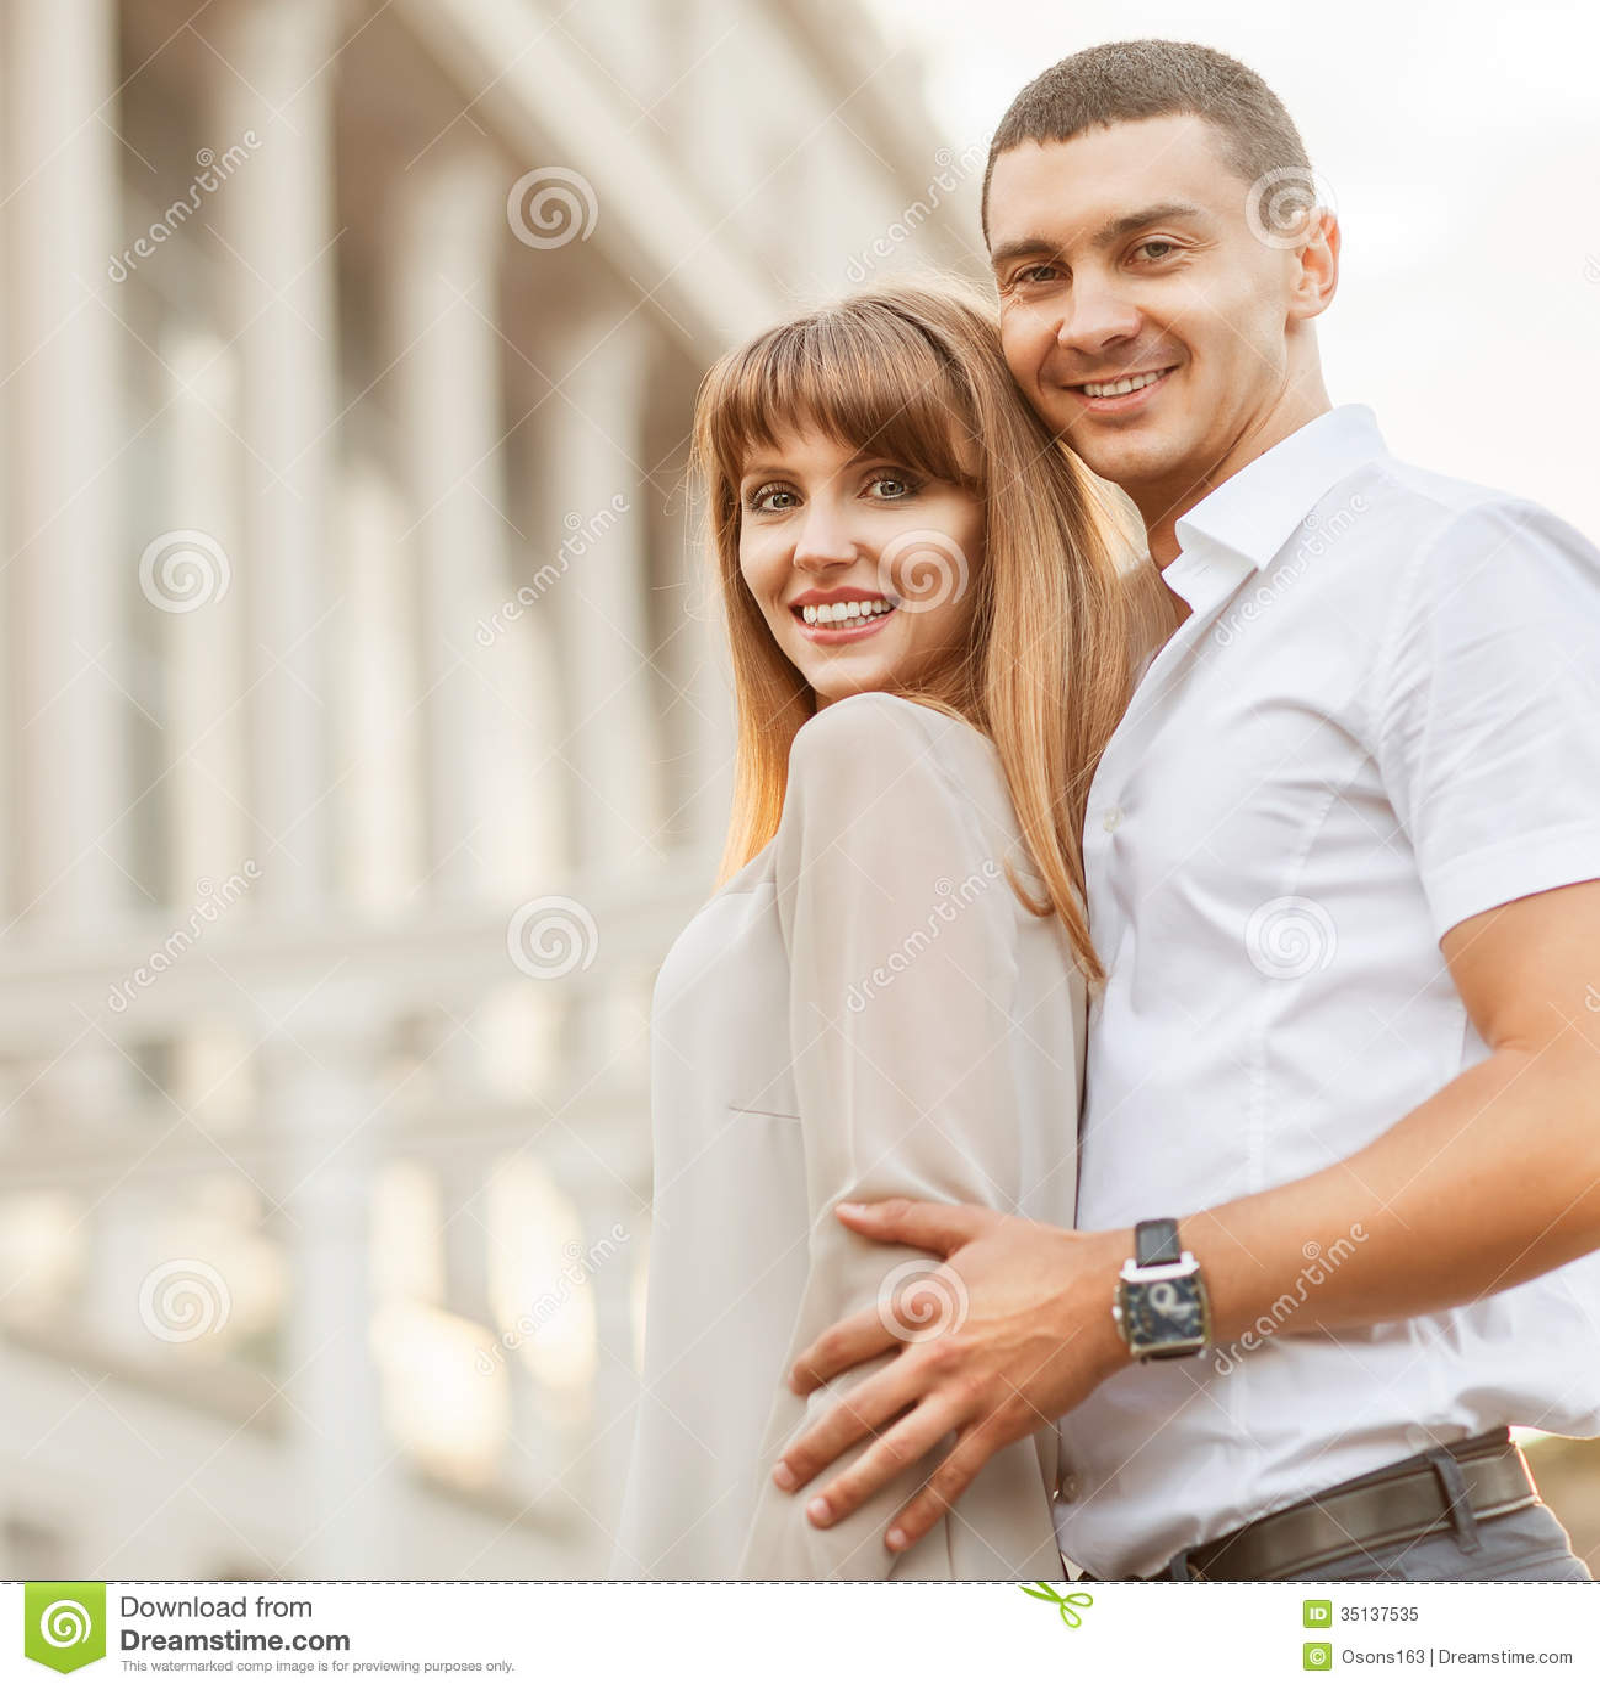 Interracial dating dallas city data